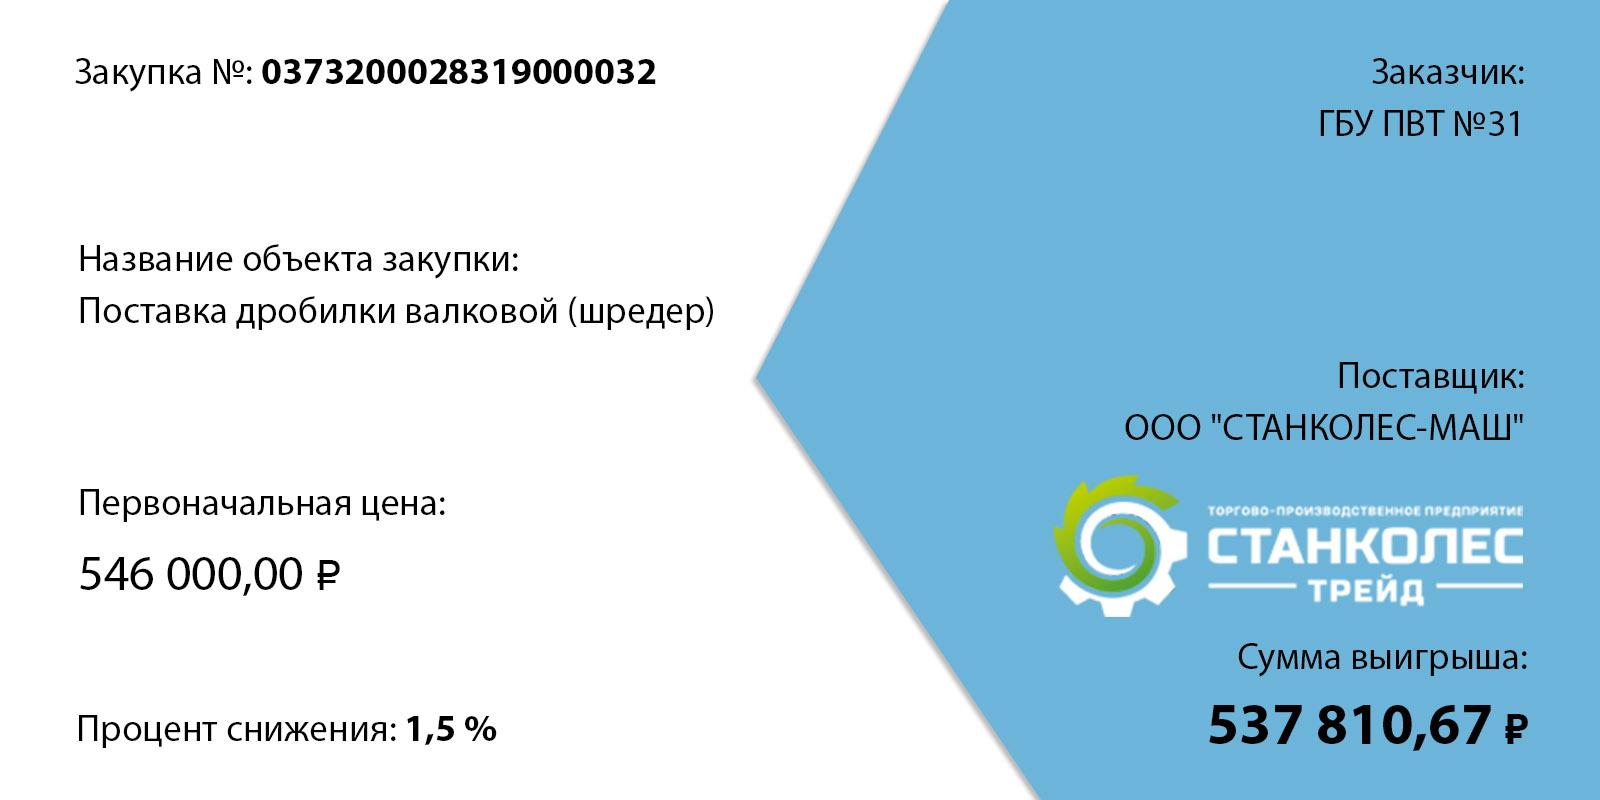 кейсы-станколесмаш 537810